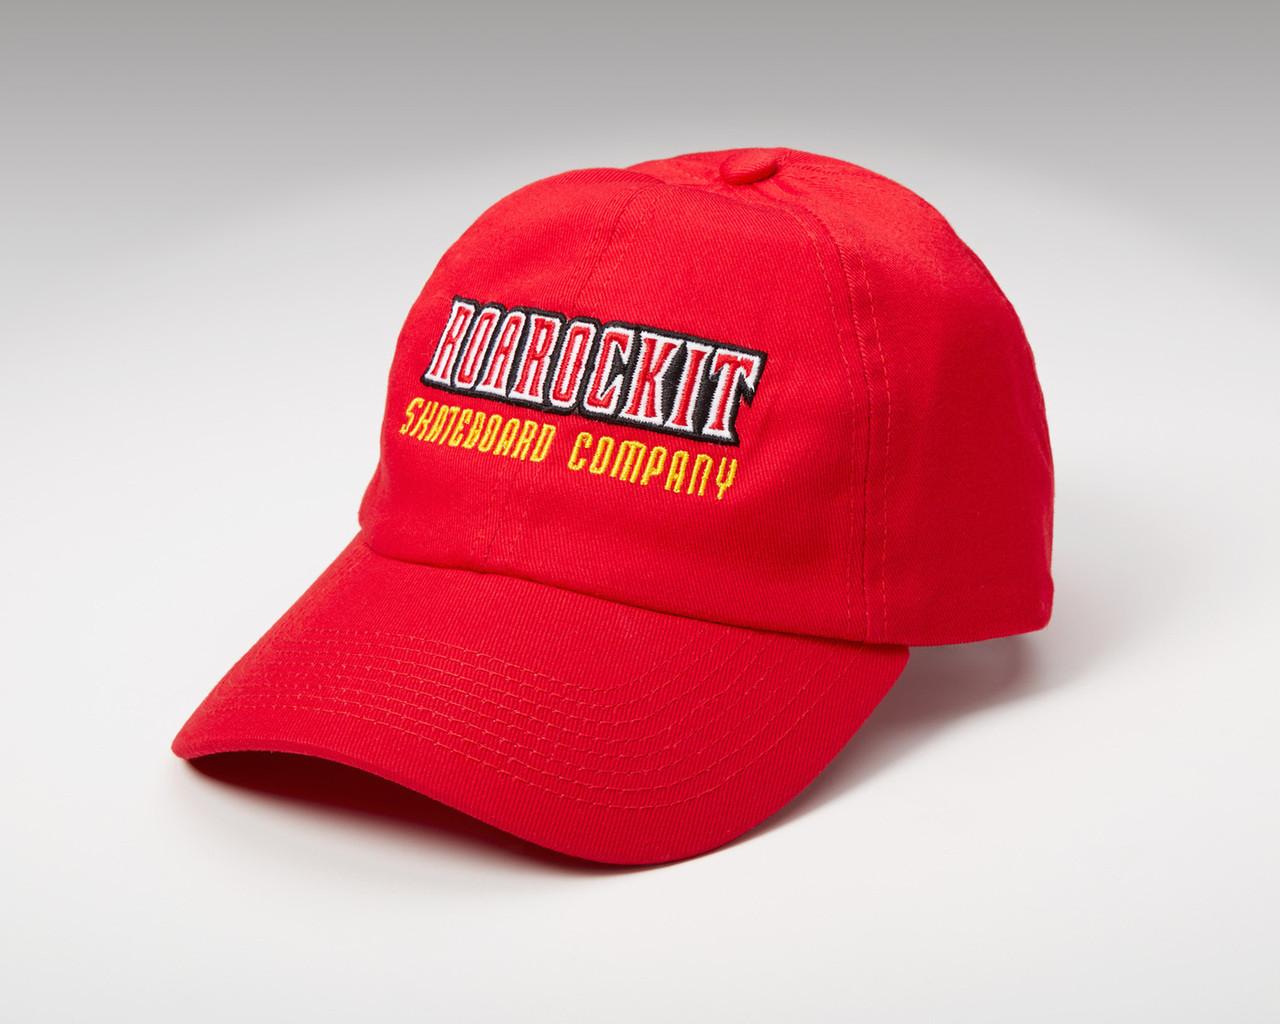 b7d7e615fac Red Ball Cap - Roarockit USA